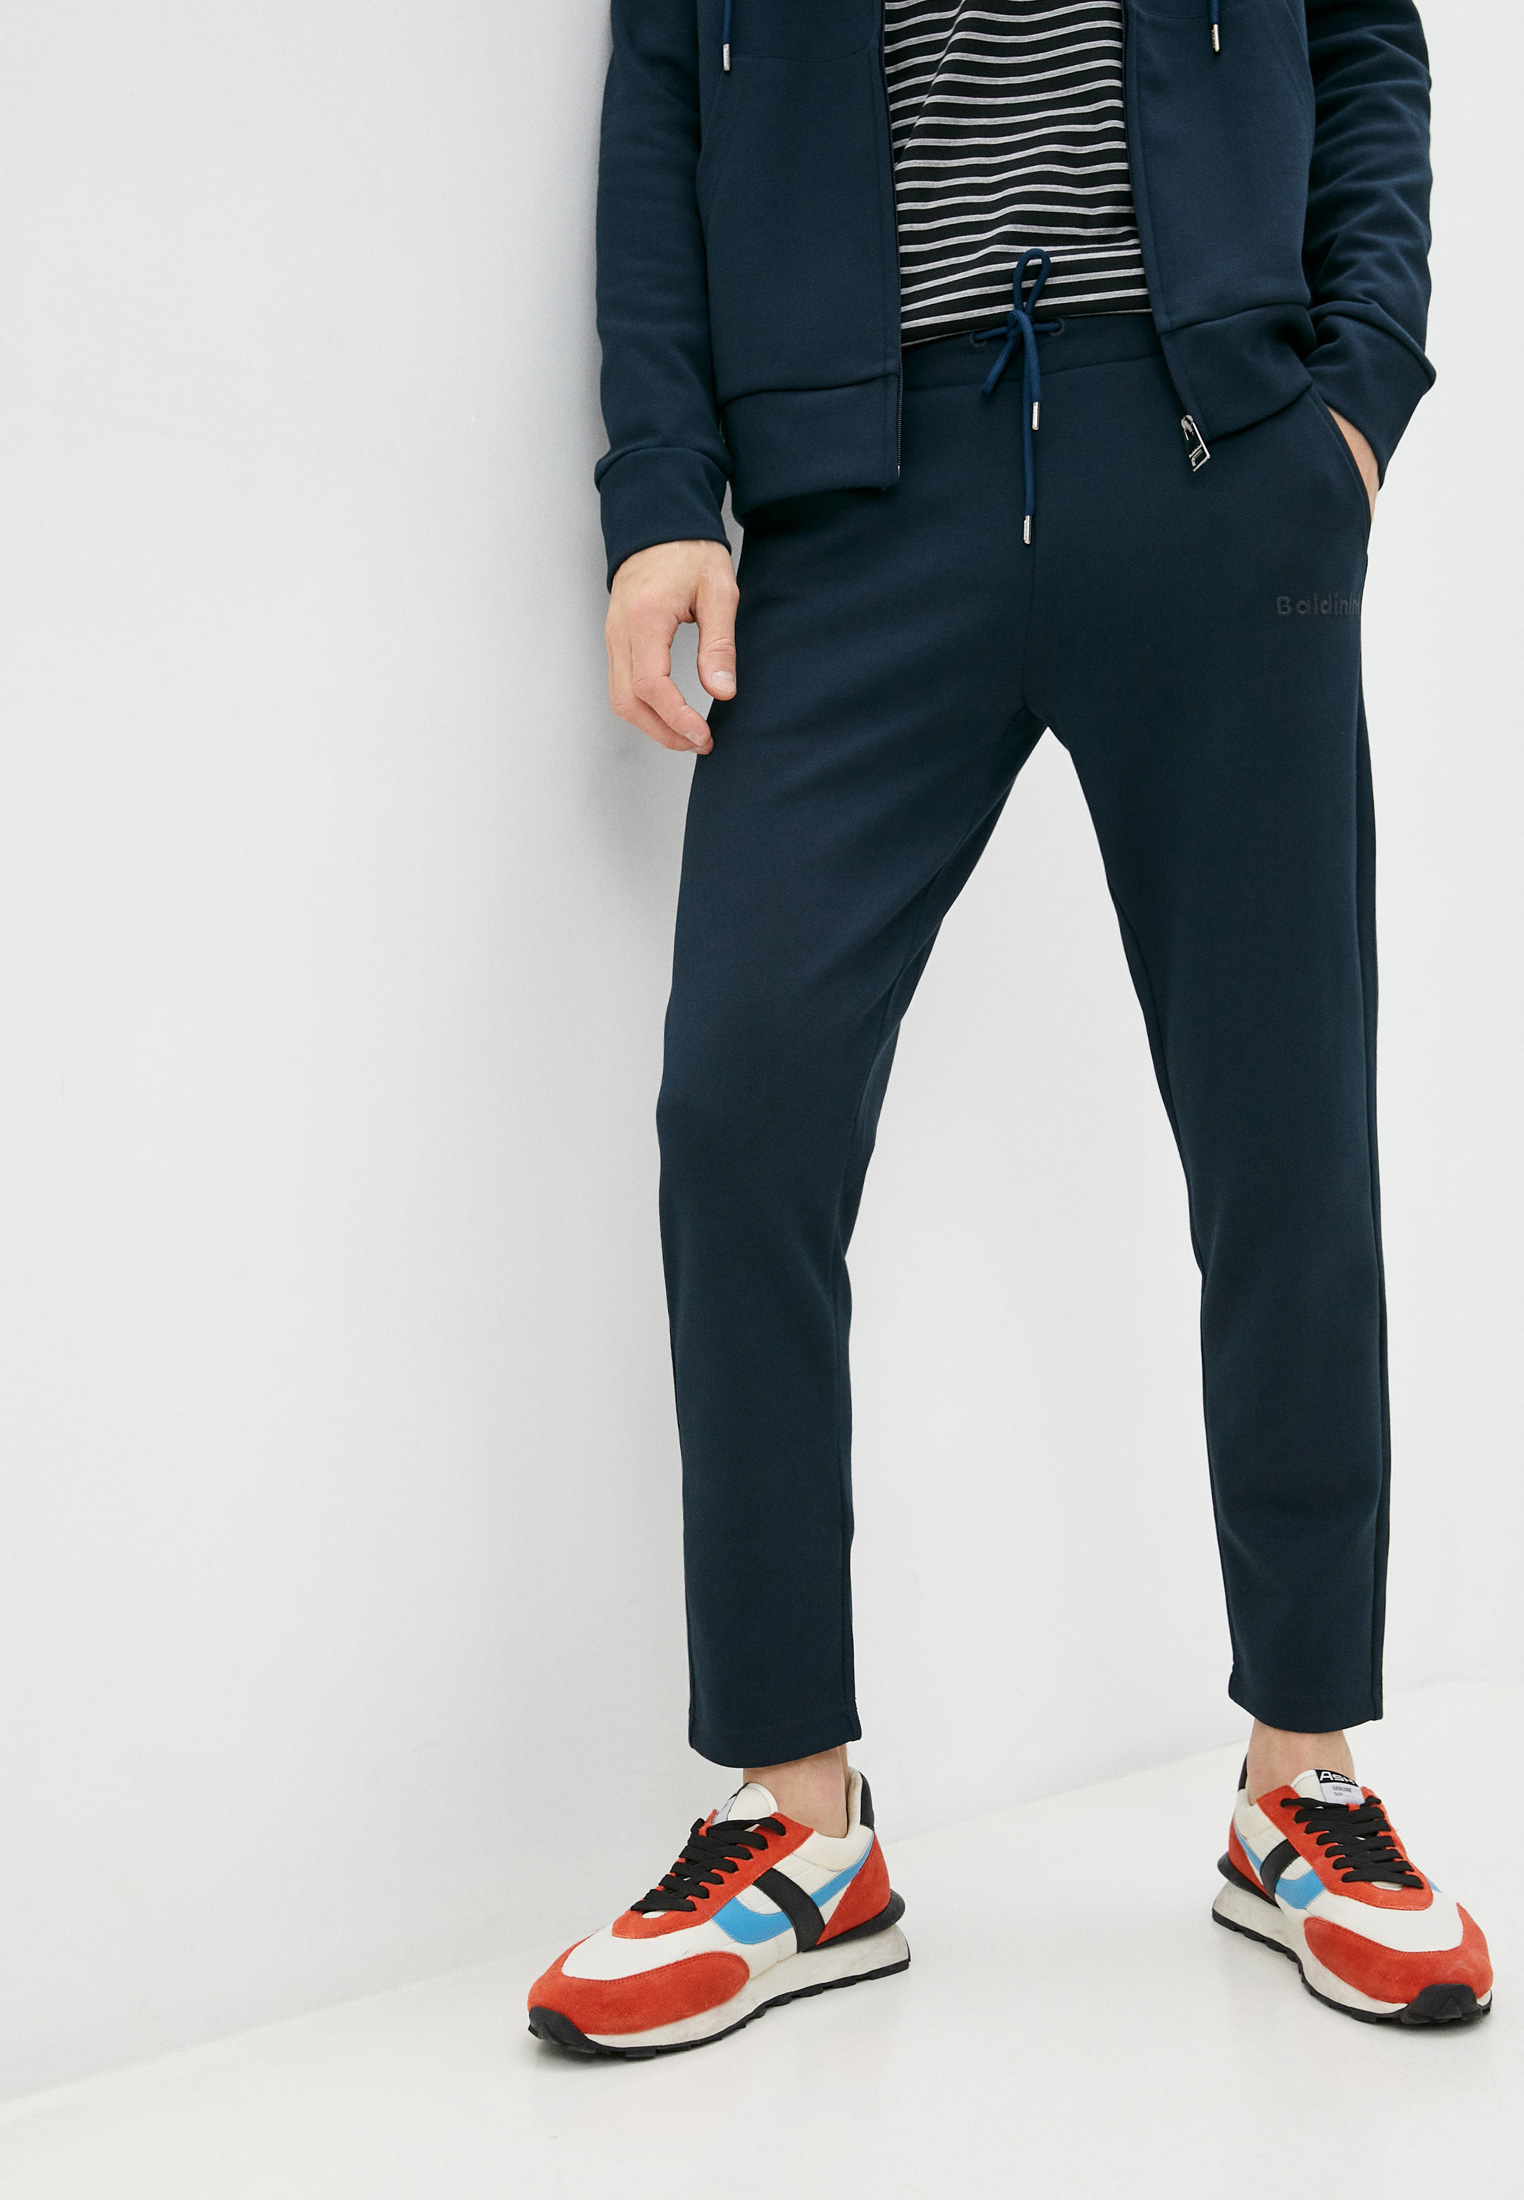 Мужские спортивные брюки Baldinini (Балдинини) Брюки спортивные Baldinini